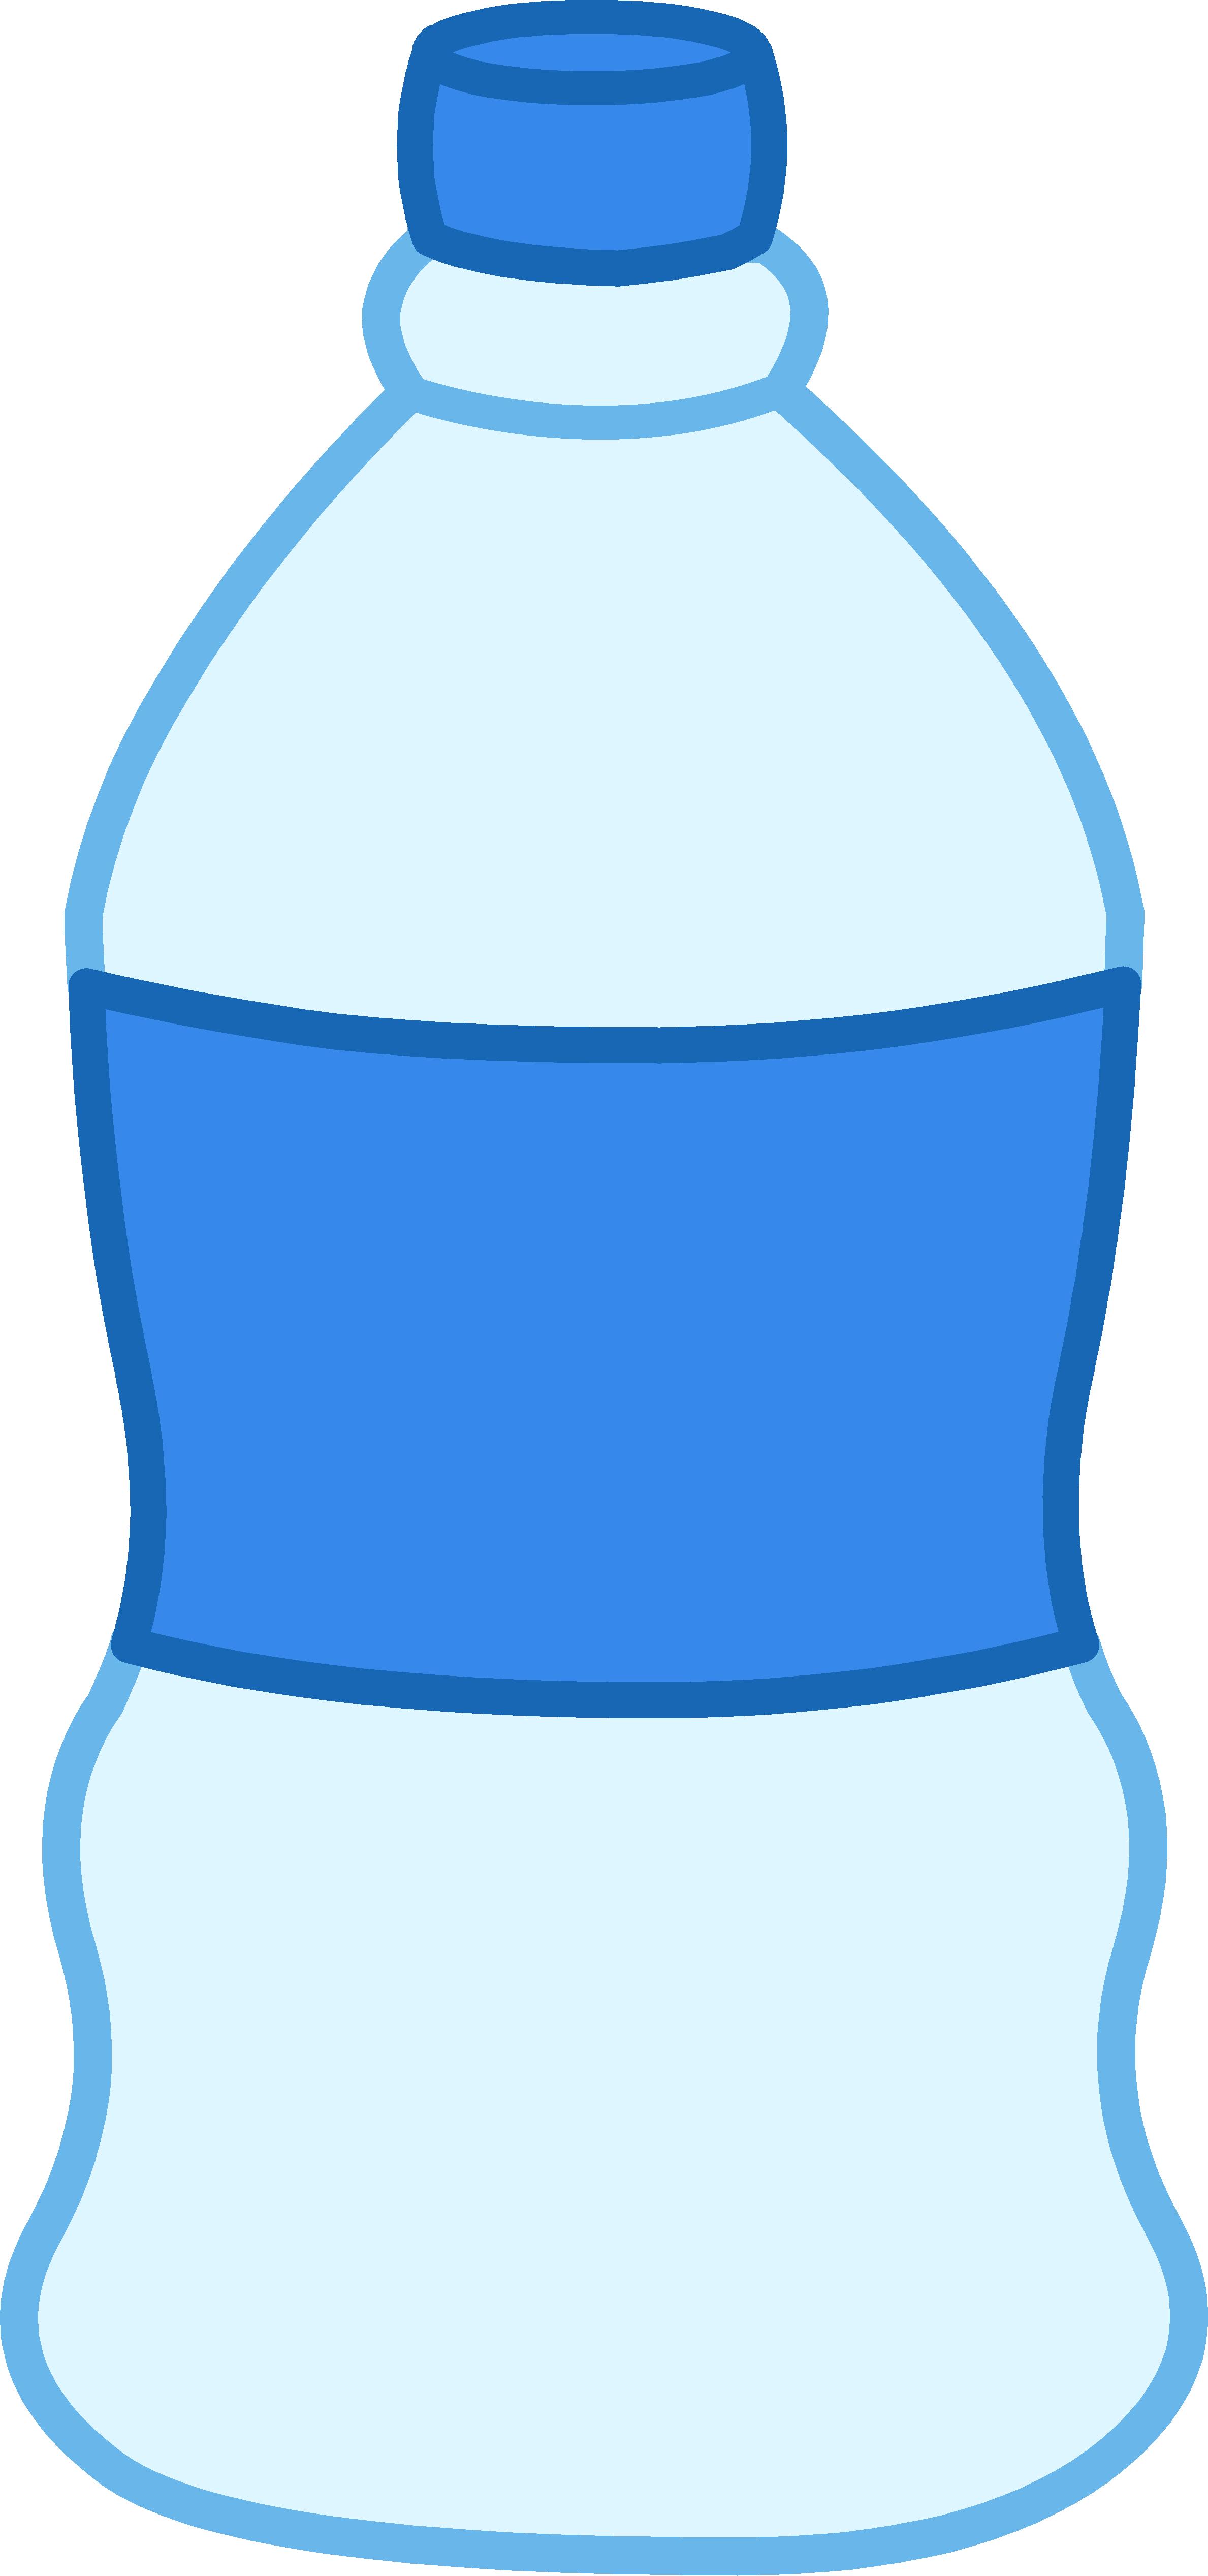 Cartoon Water Bottle Clip Art